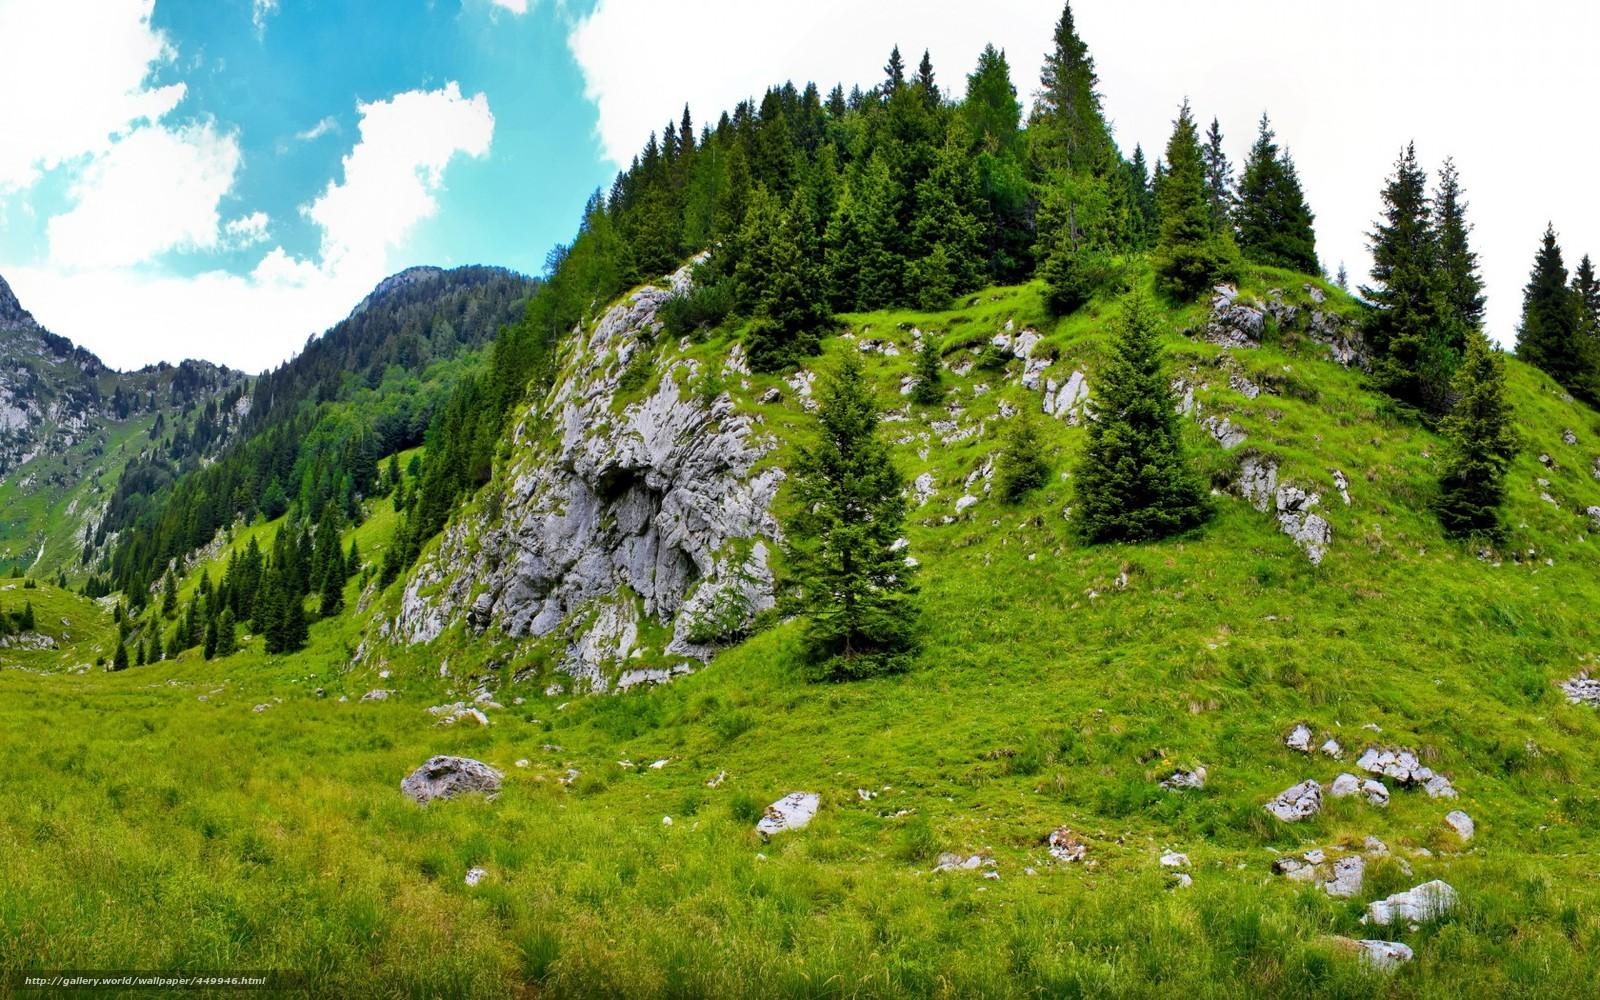 Scaricare gli sfondi montagna pendenza slovenia estate for Desktop gratis estate